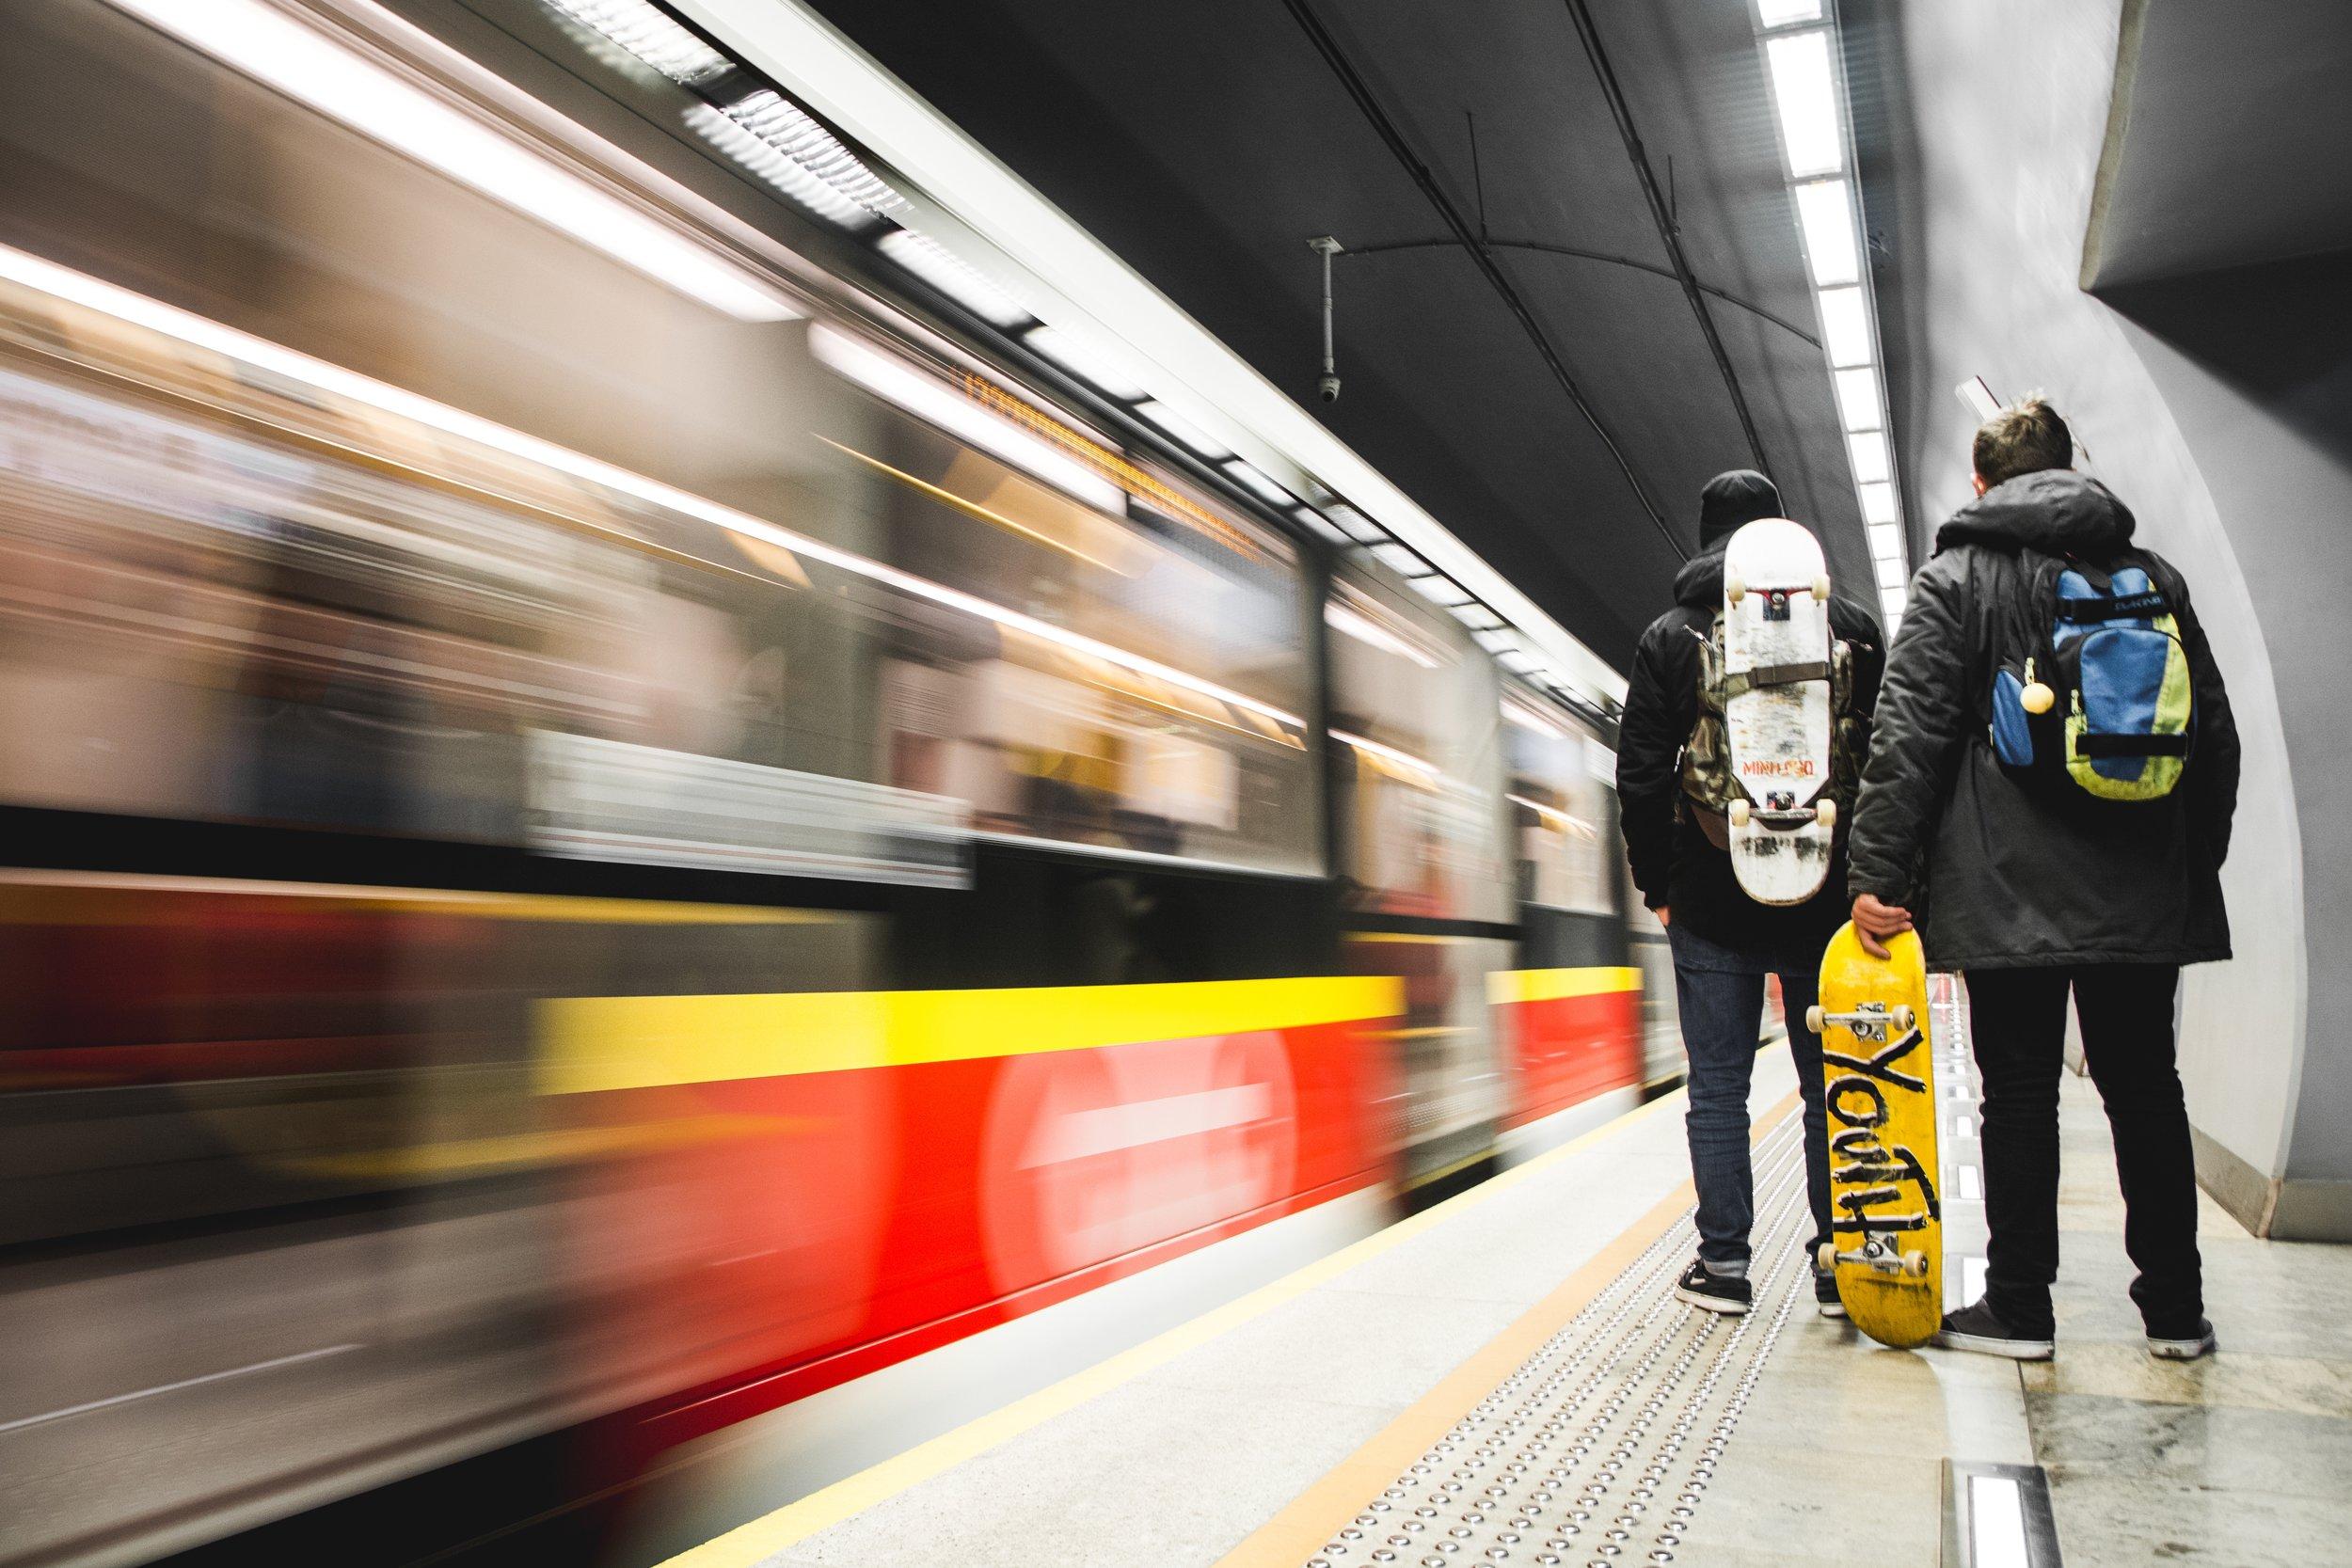 The Warsaw Metro, a place where Black Roman used to frequent often. Photo source: Karol Kaczorek, Unsplash